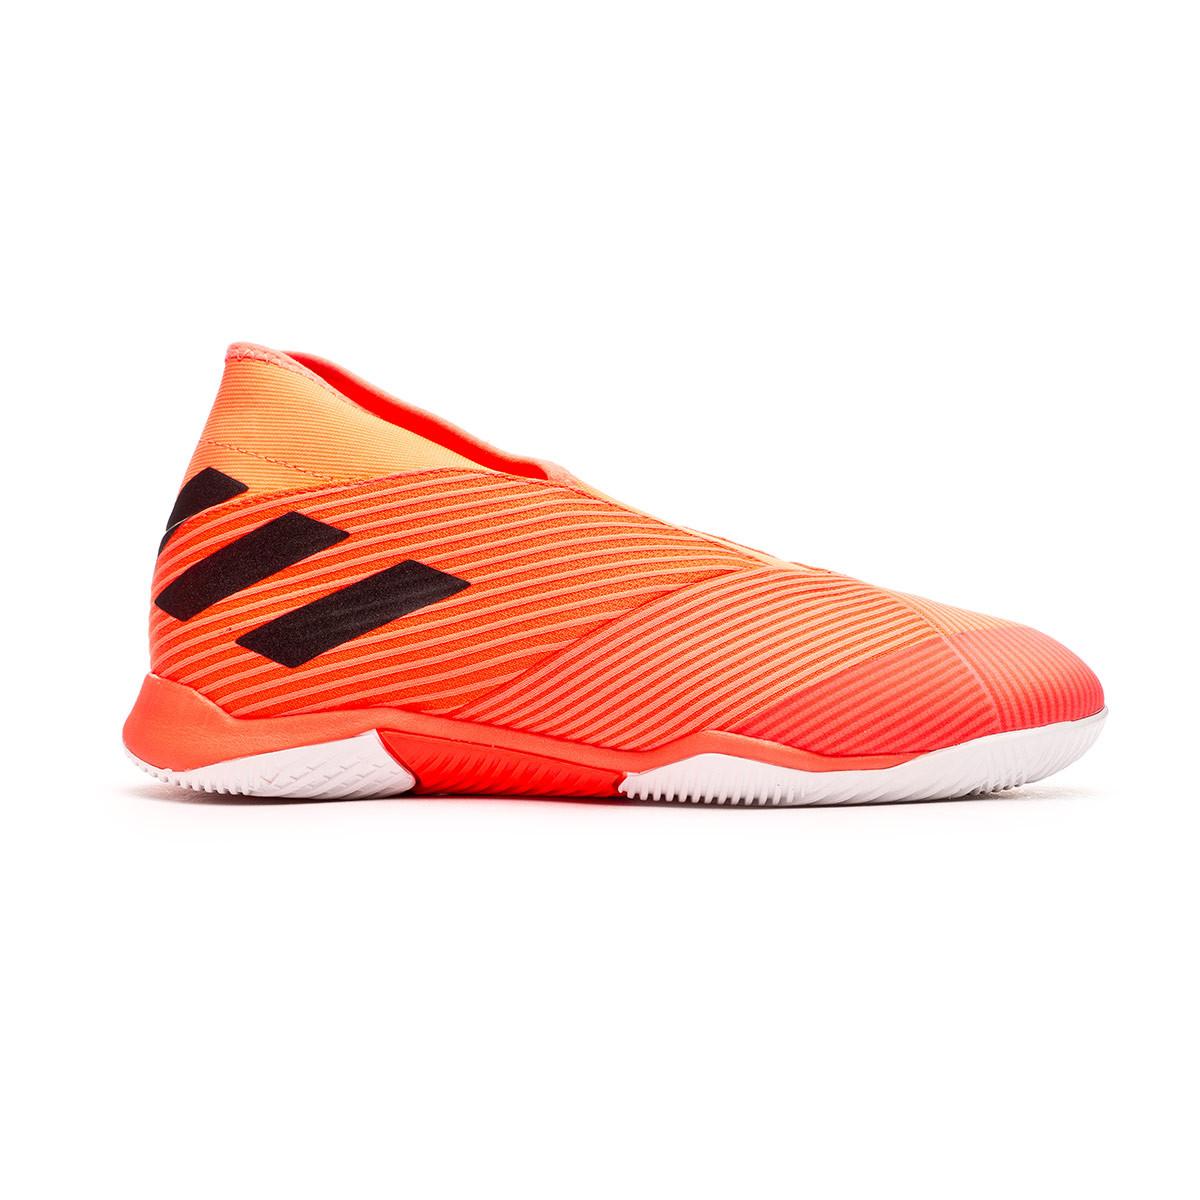 Chaussure de futsal adidas Nemeziz 19.3 LL IN